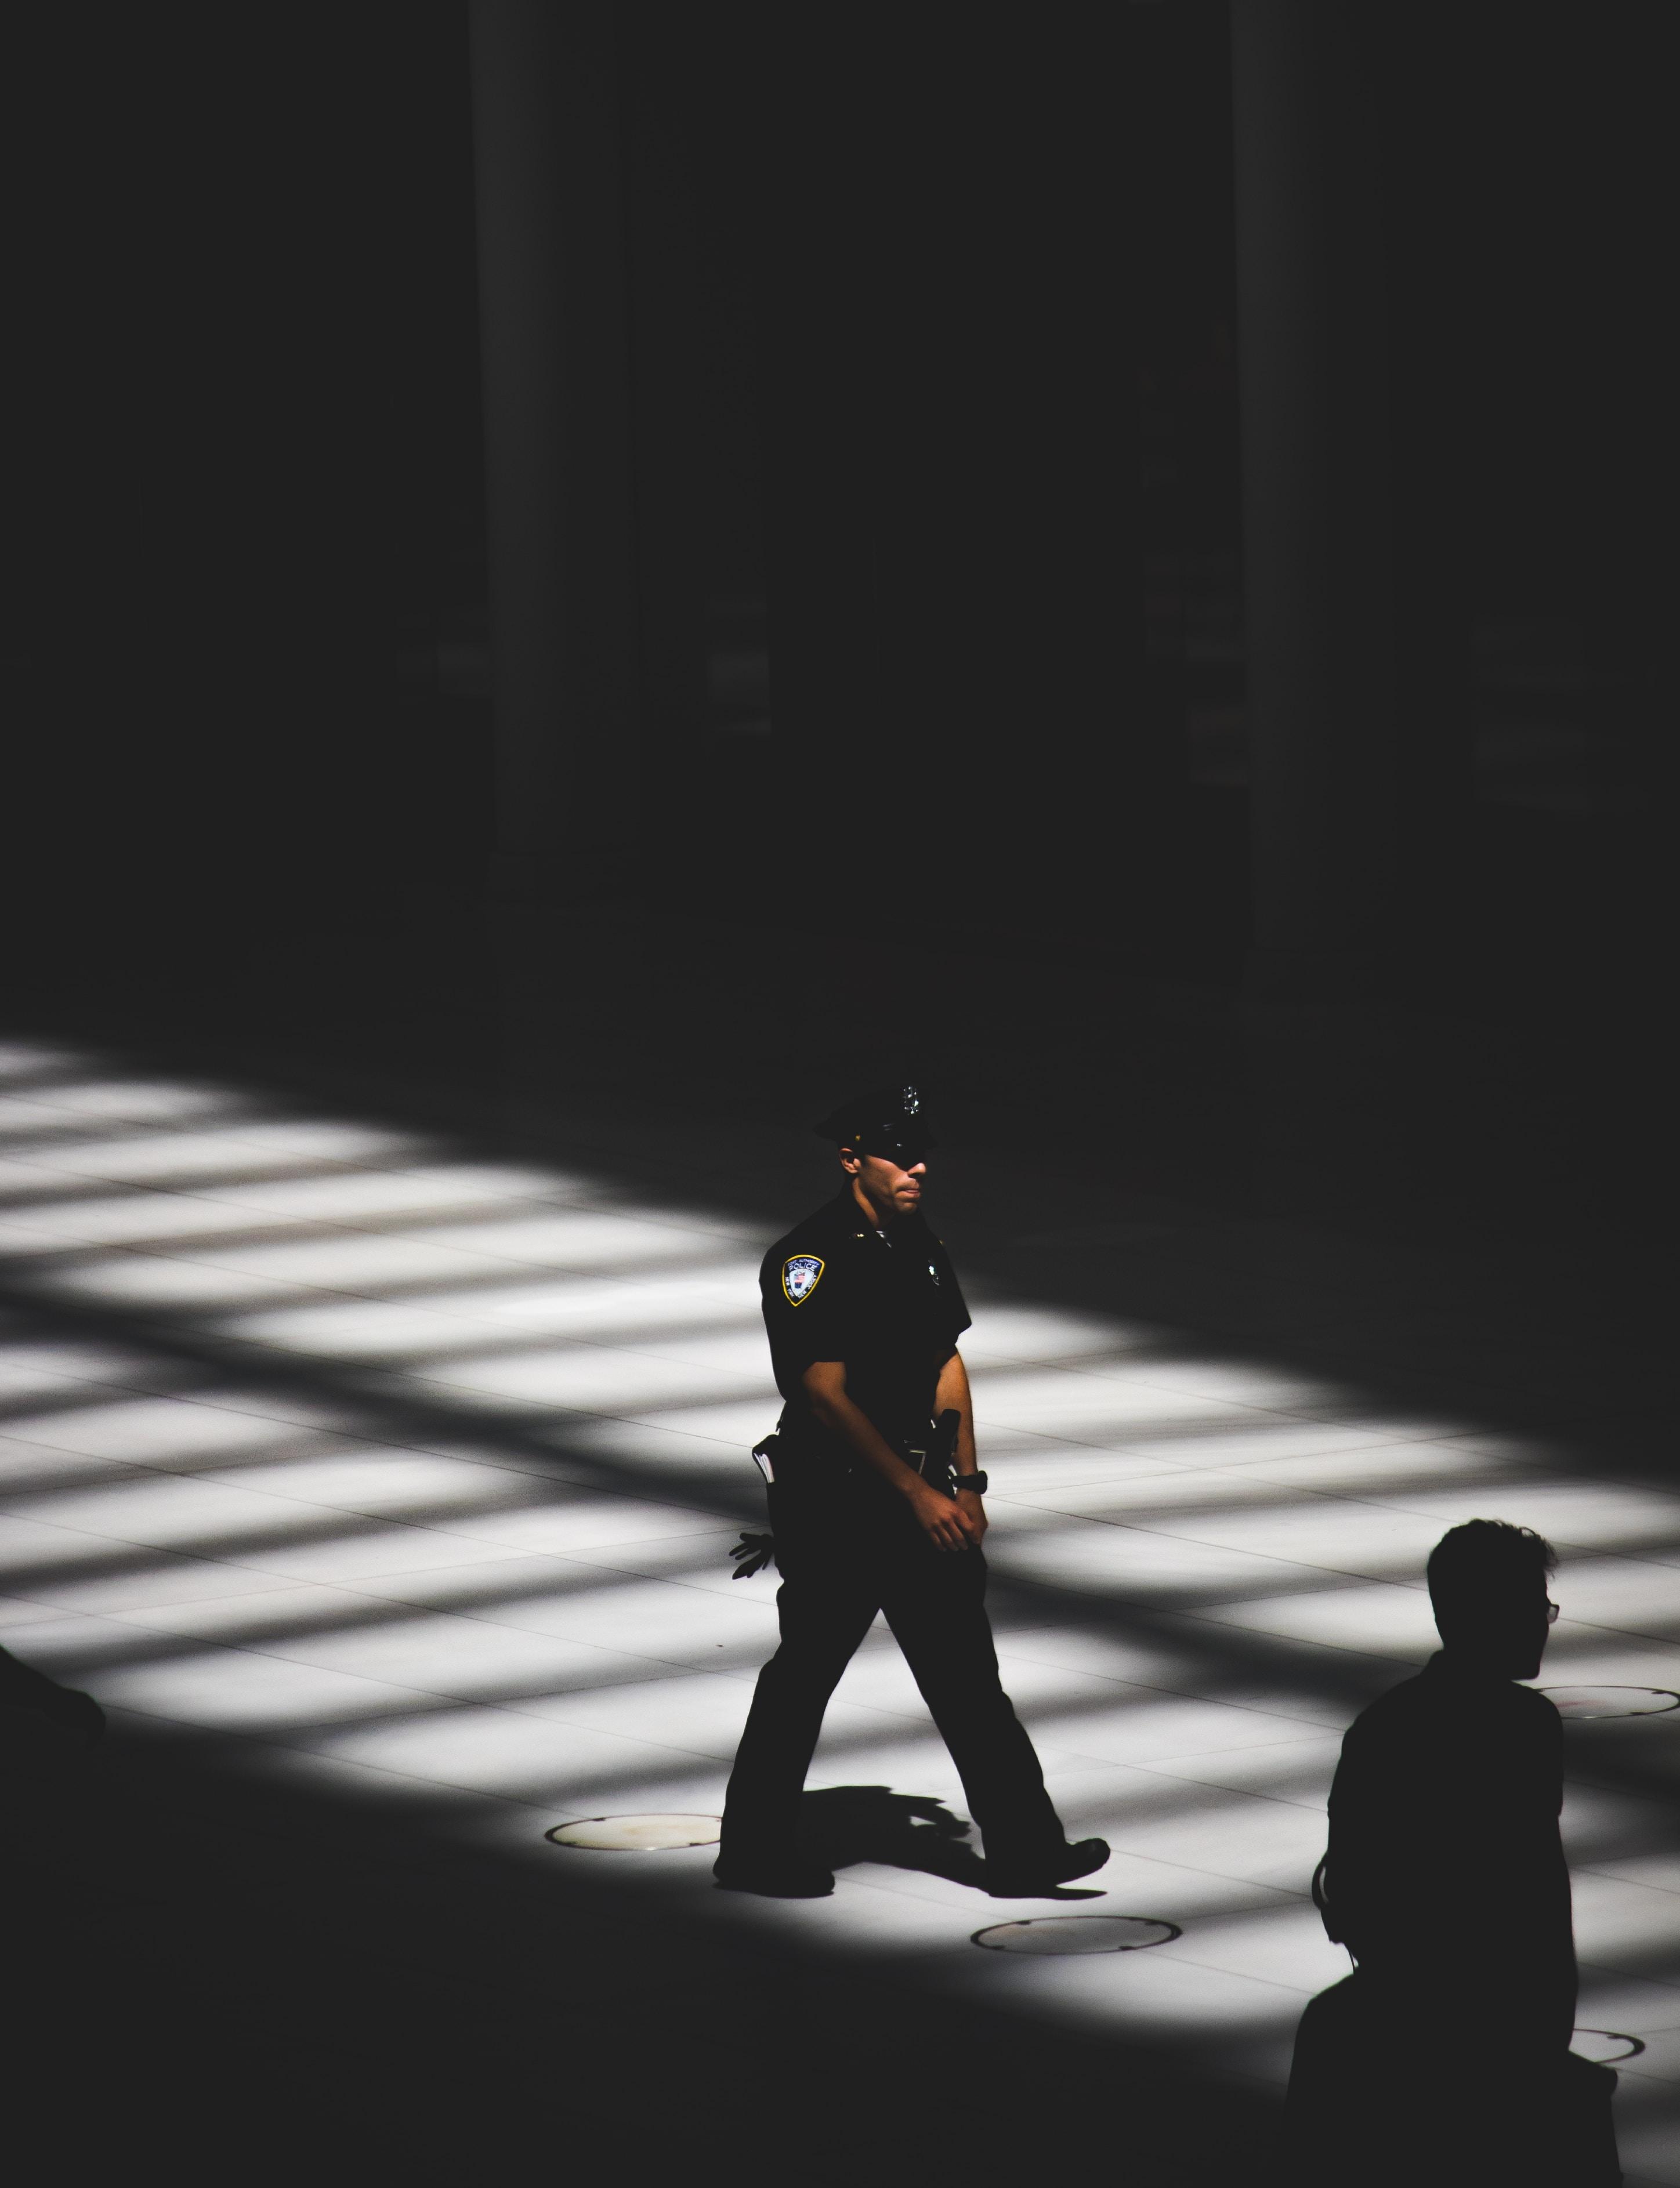 man in black police uniform